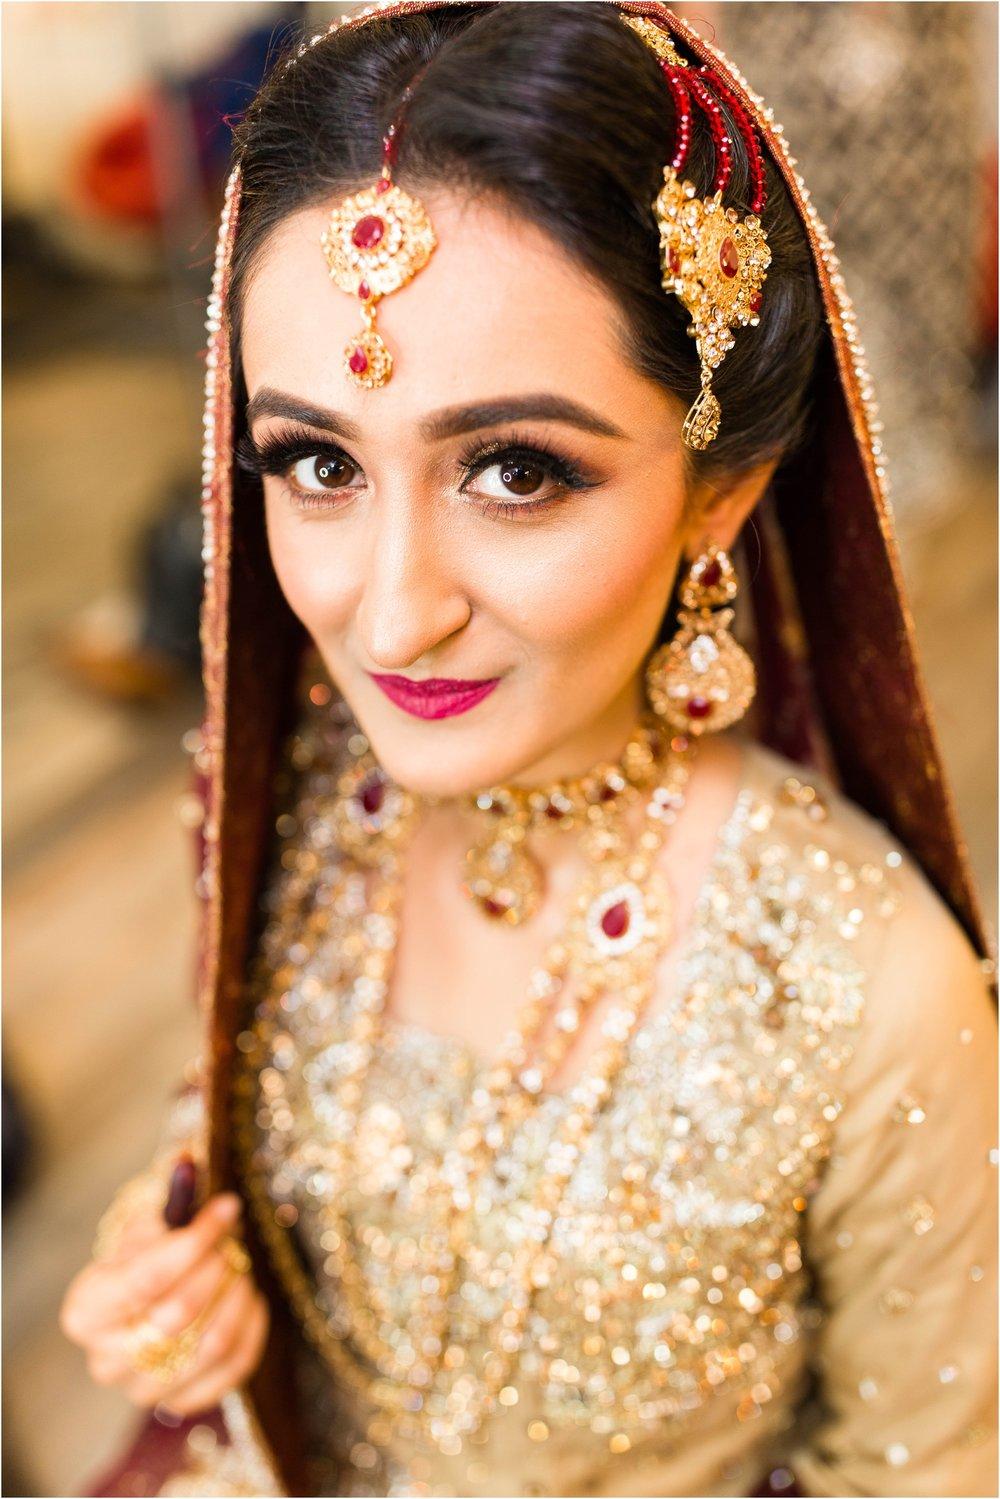 Scarborough-Convention-Centre-Baraat-Toronto-Mississauga-Brampton-Scarborough-GTA-Pakistani-Indian-Wedding-Engagement-Photographer-Photography_0011.jpg